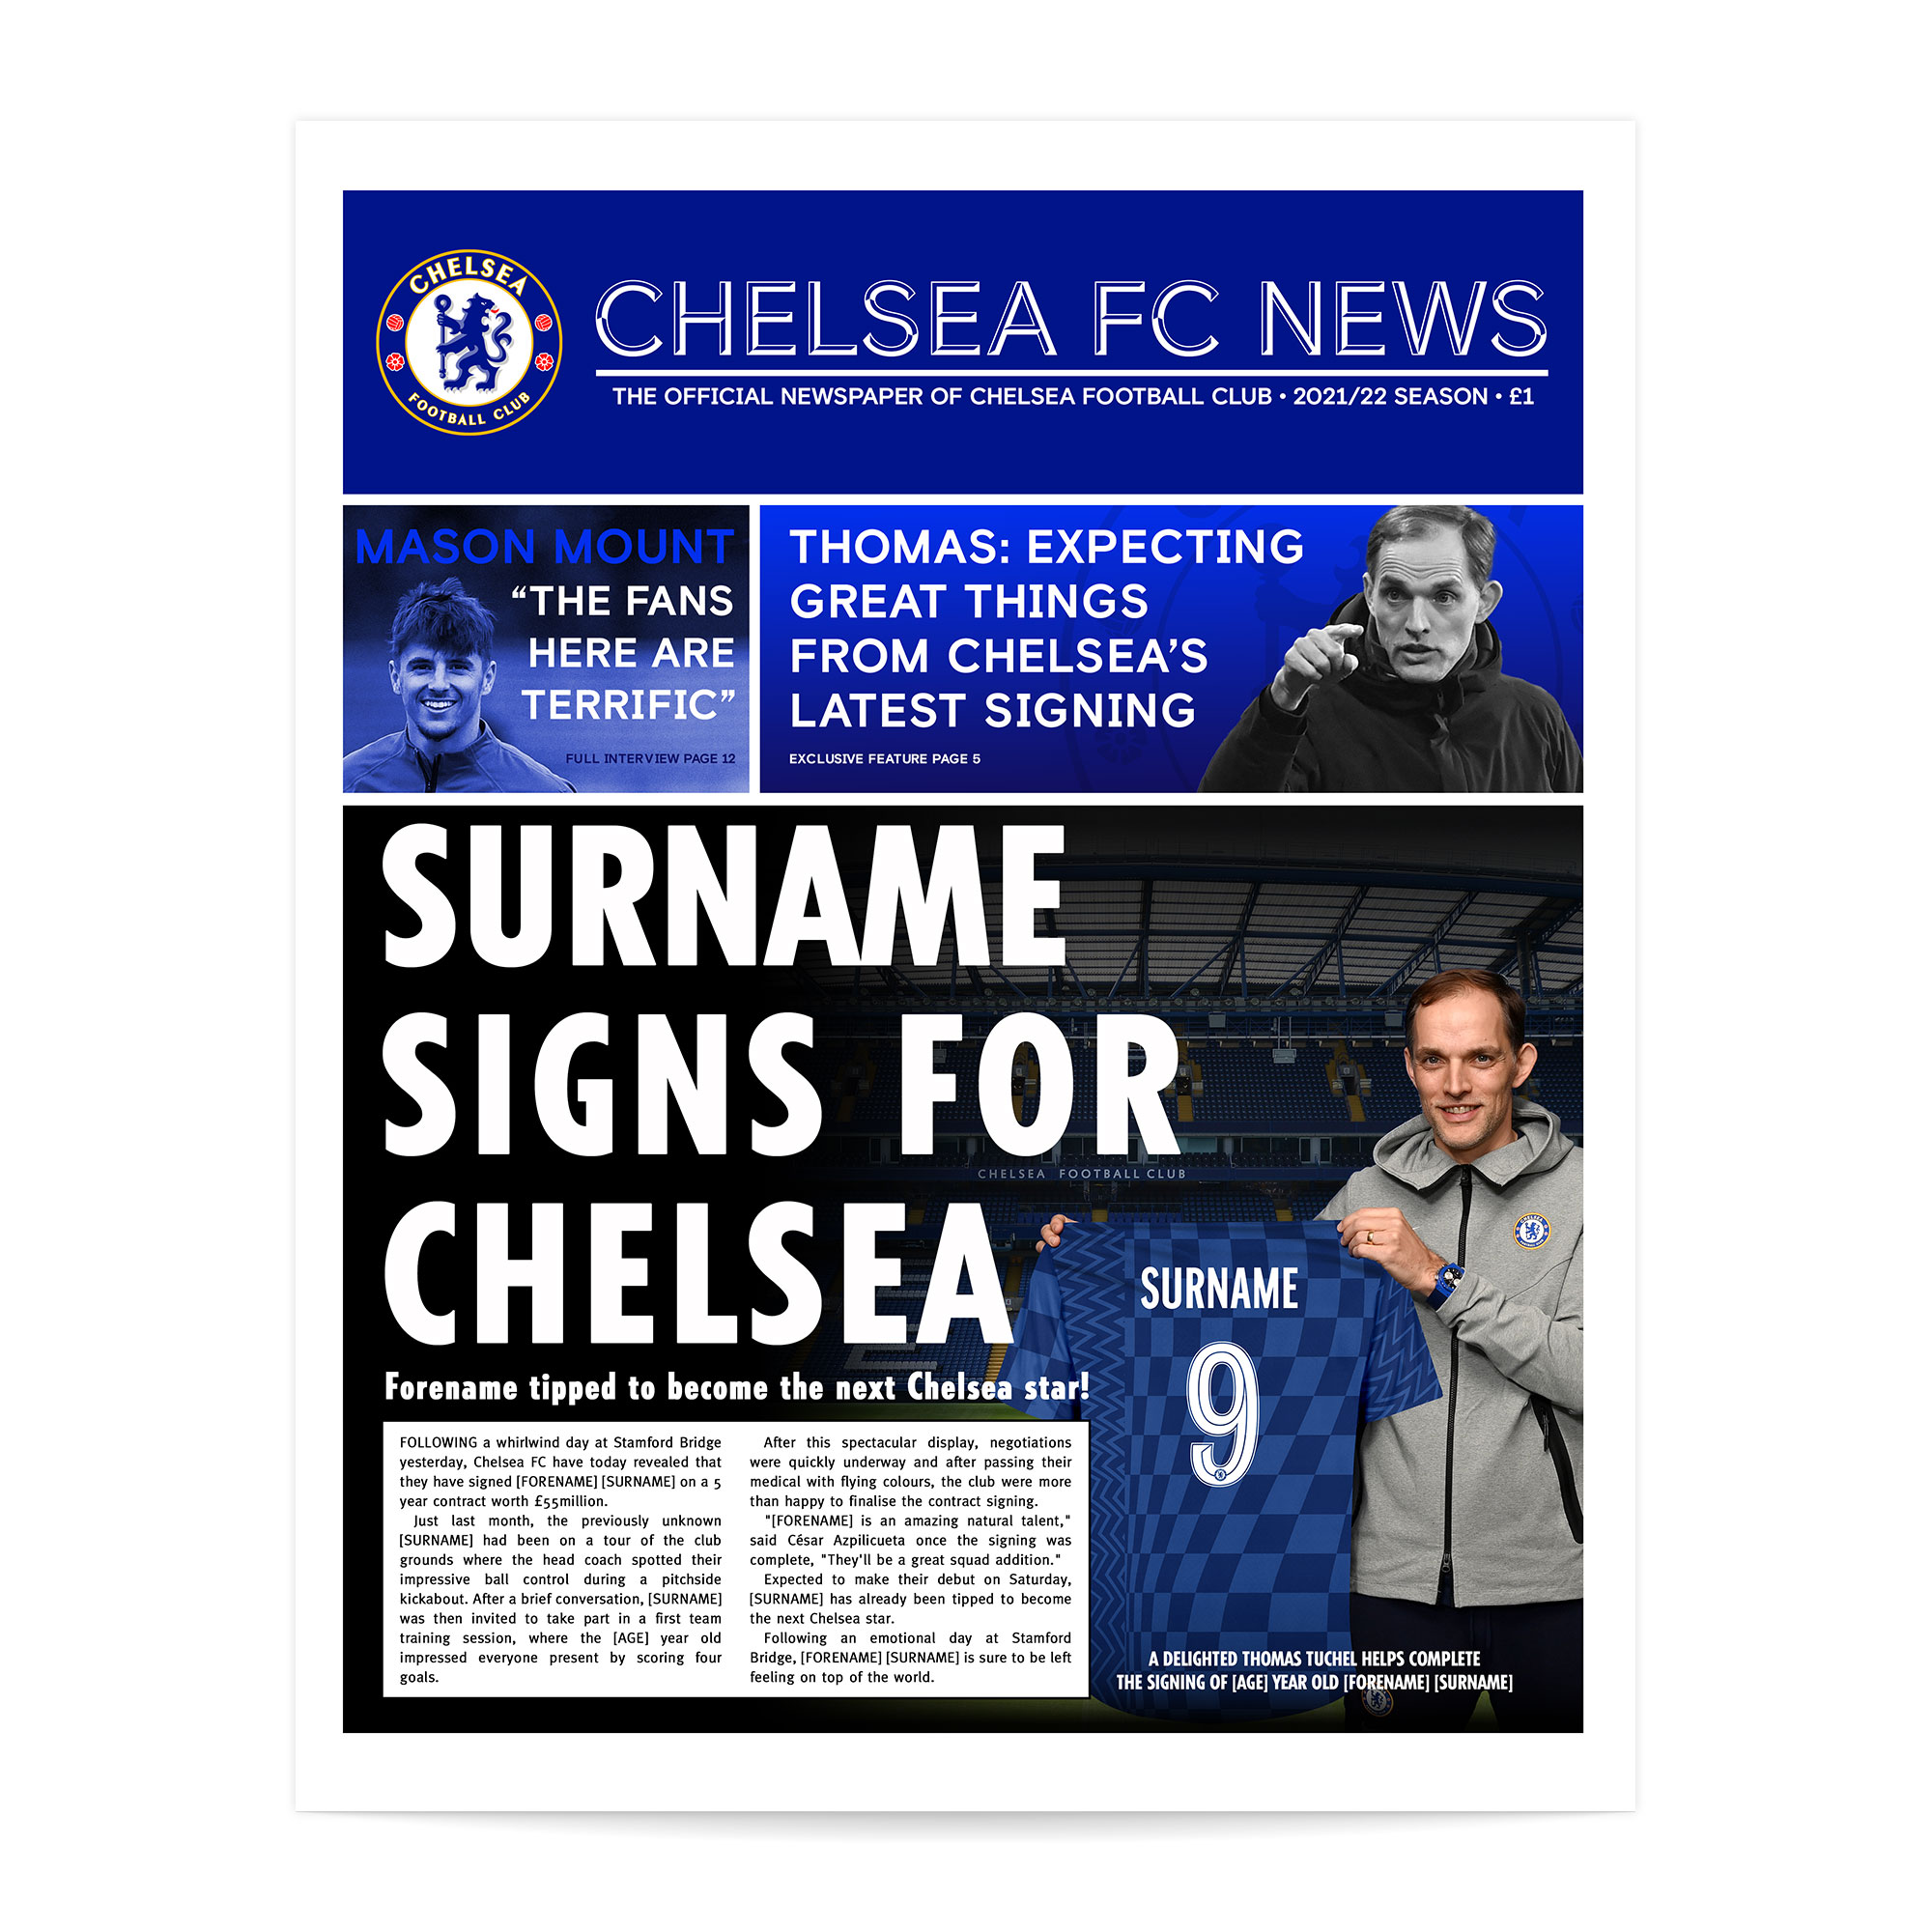 Chelsea FC News Single Page Print